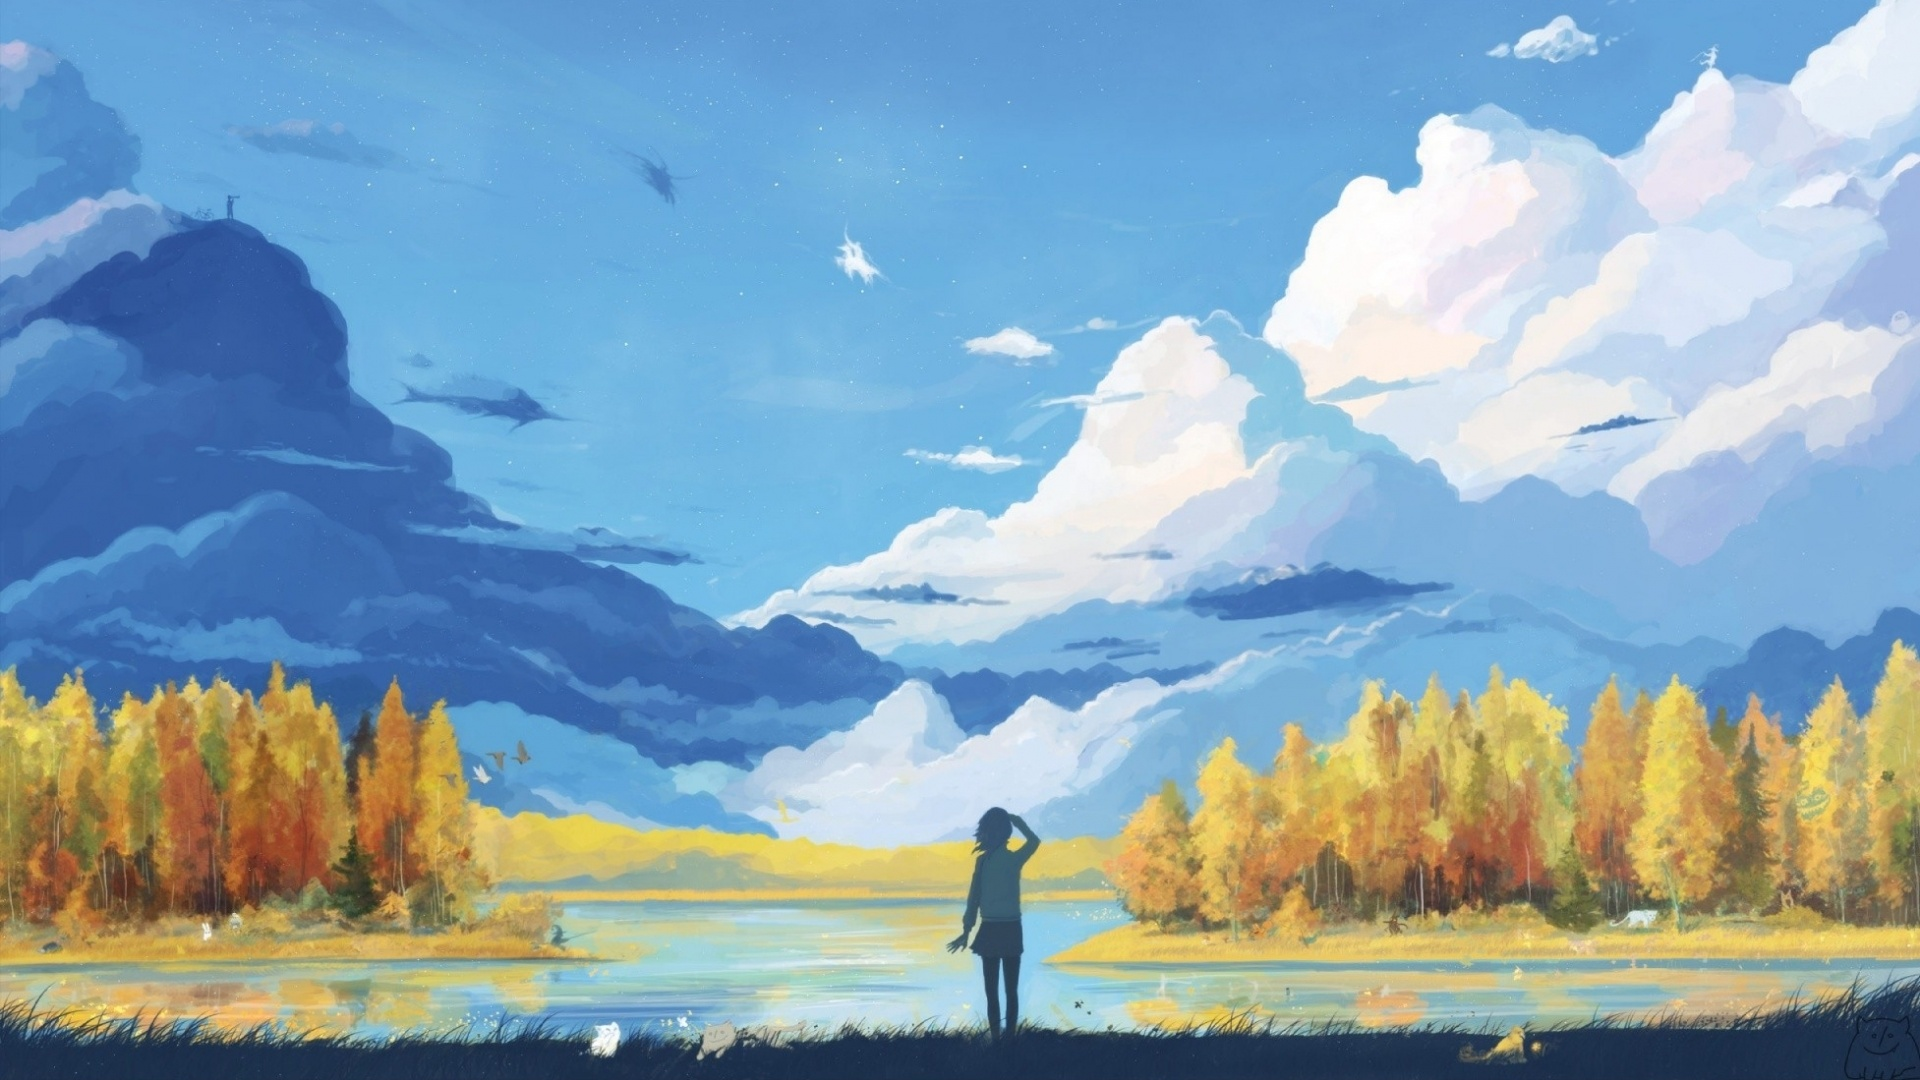 Anime Landscape Wallpaper HD 1920x1080